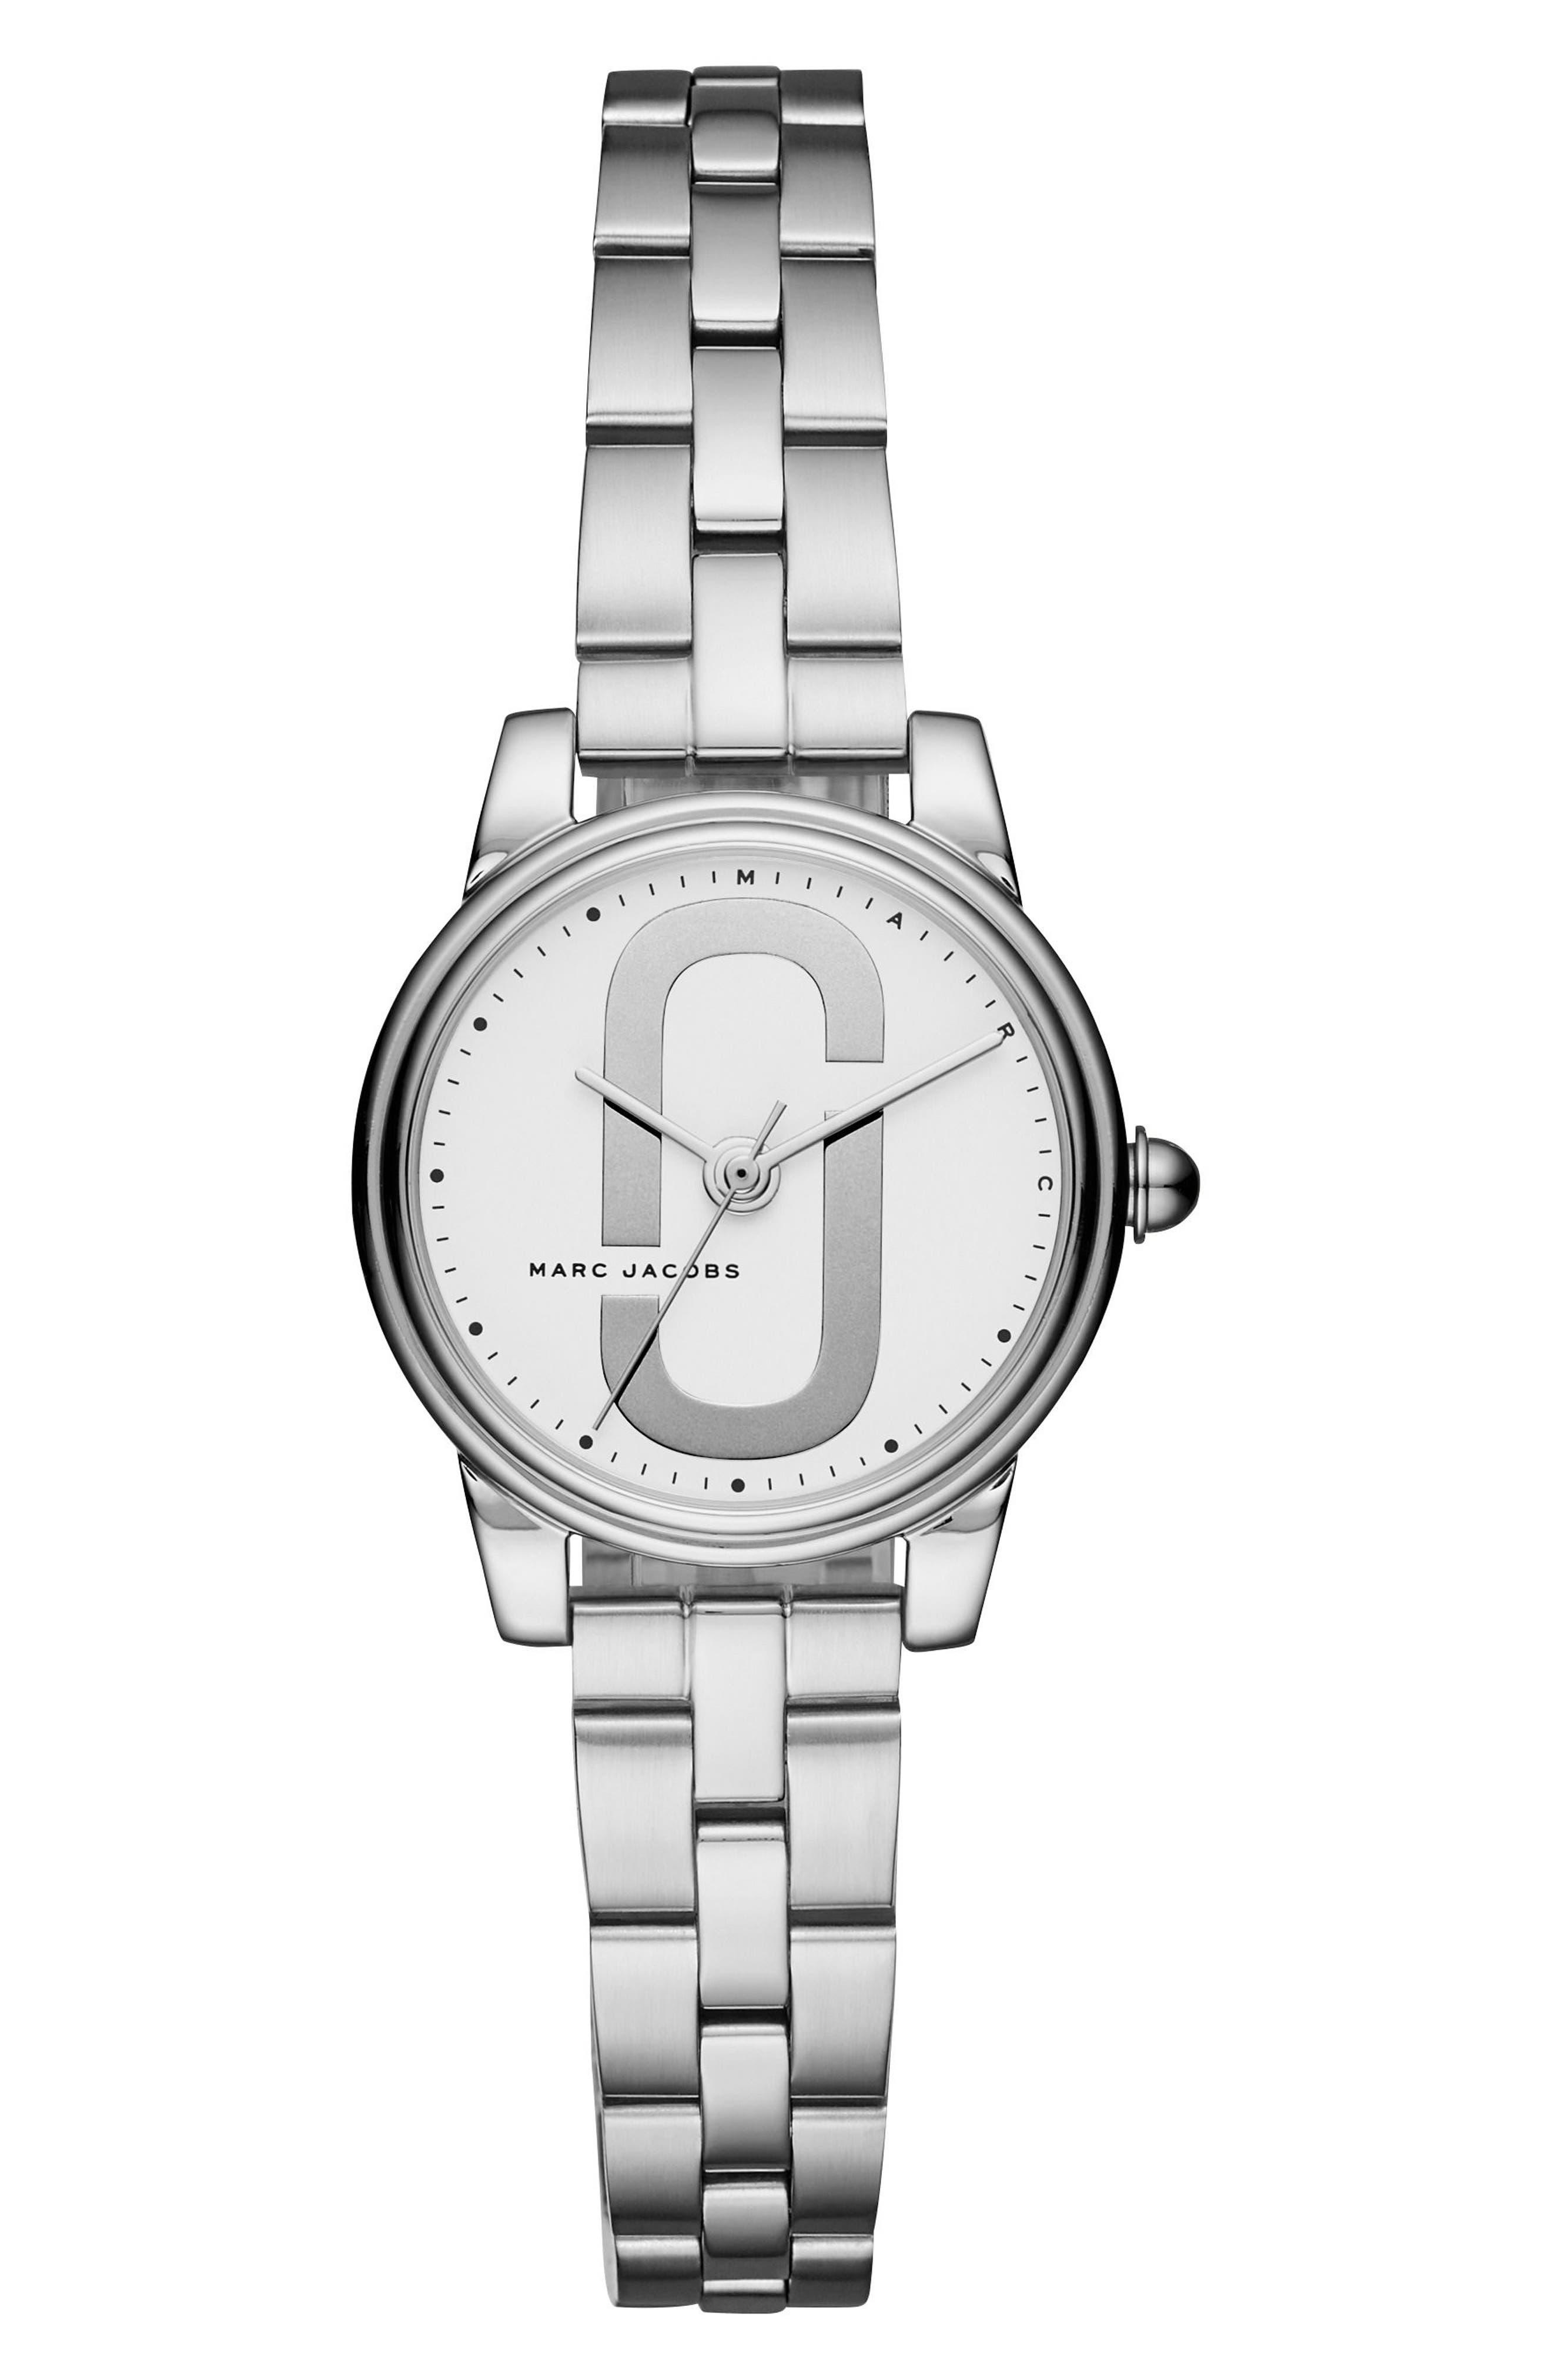 MARC JACOBS Corie Bracelet Watch, 28mm